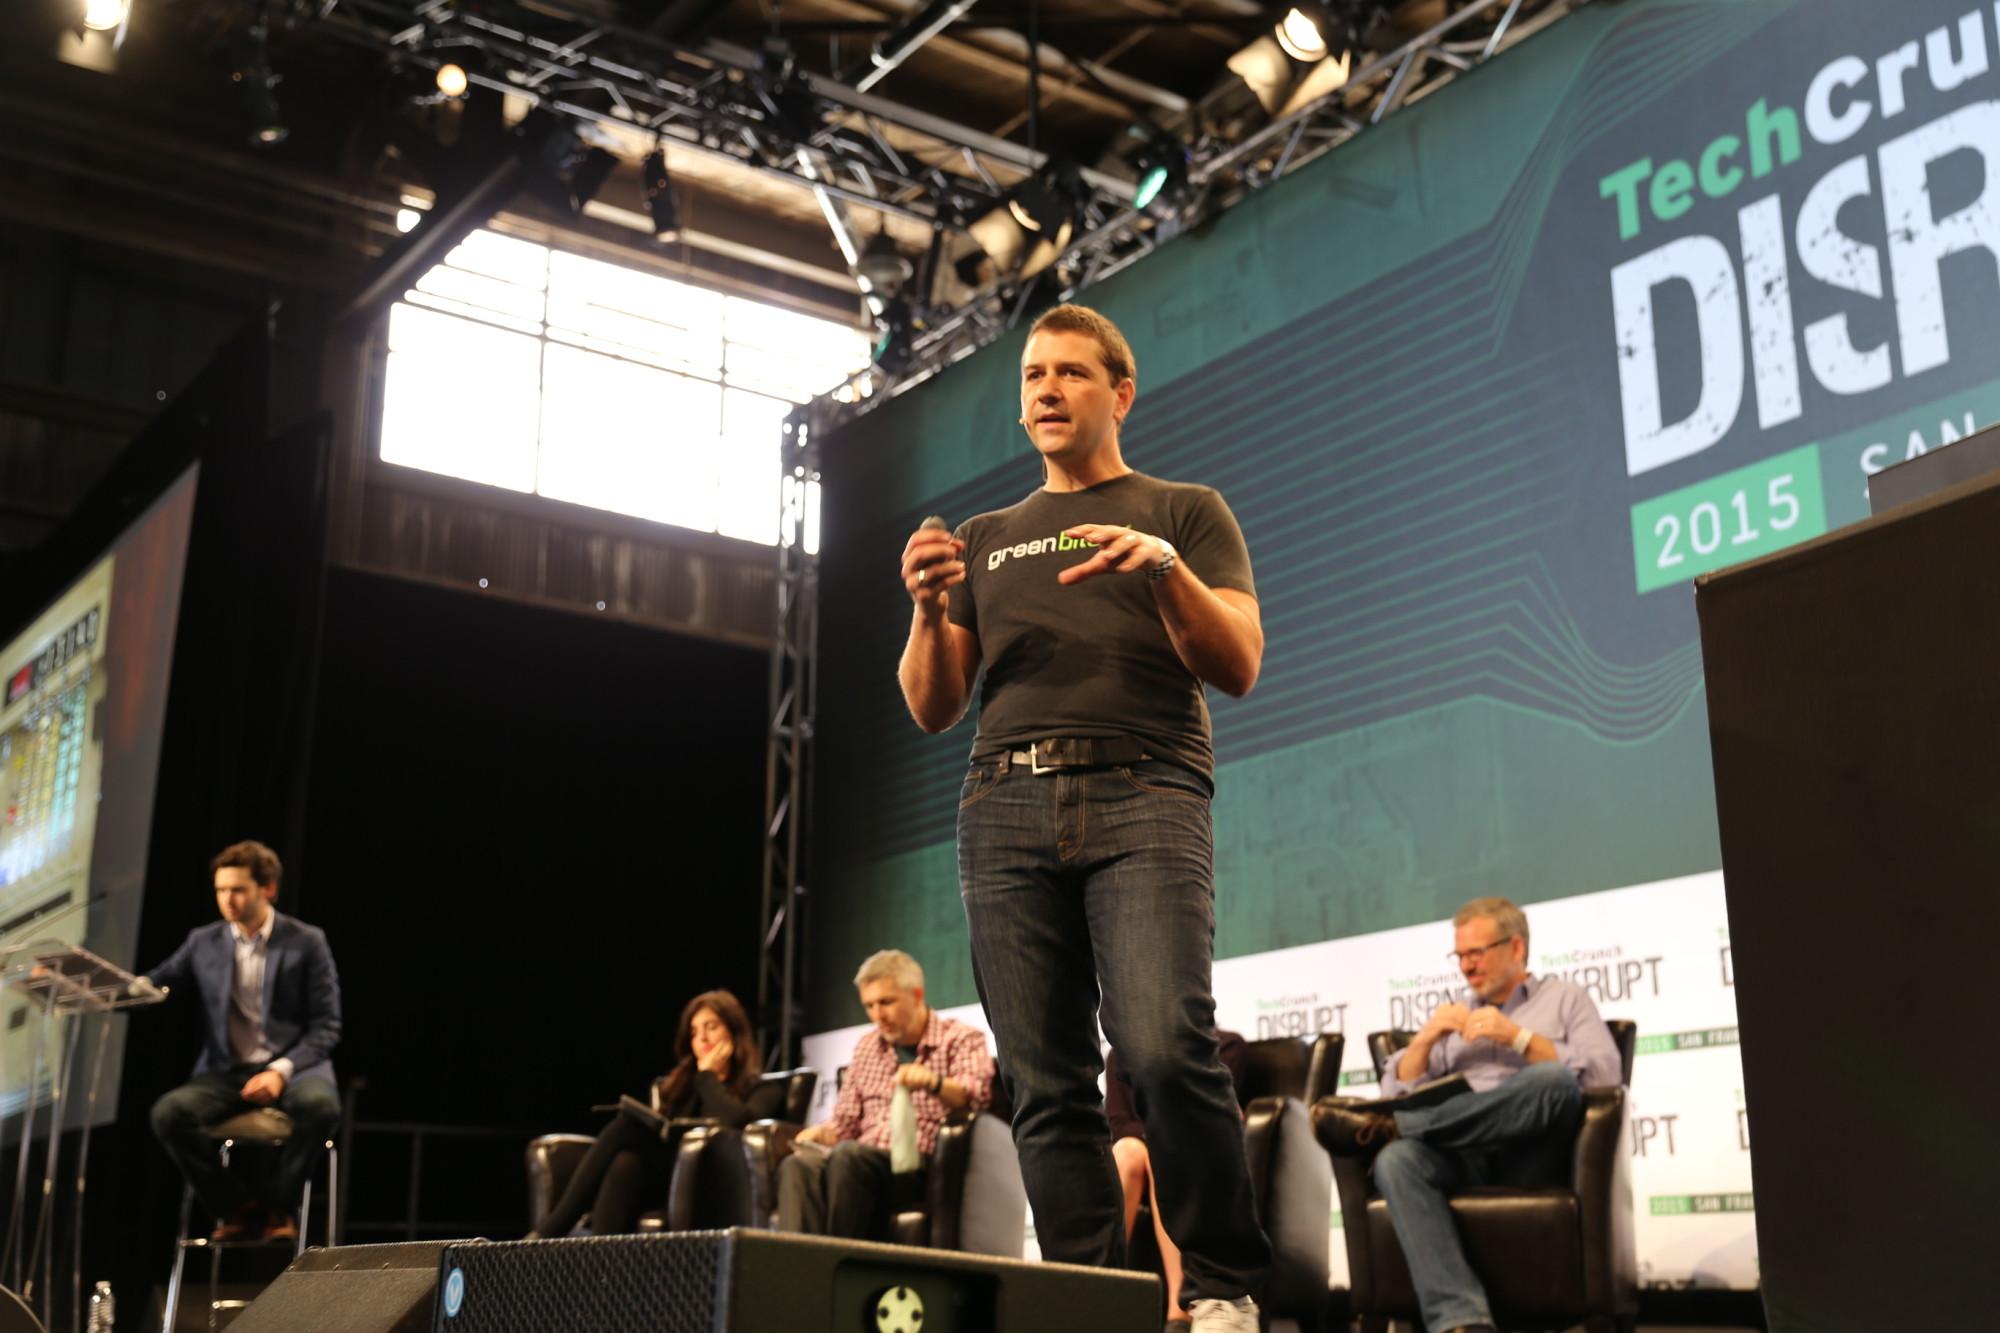 GreenBits startup